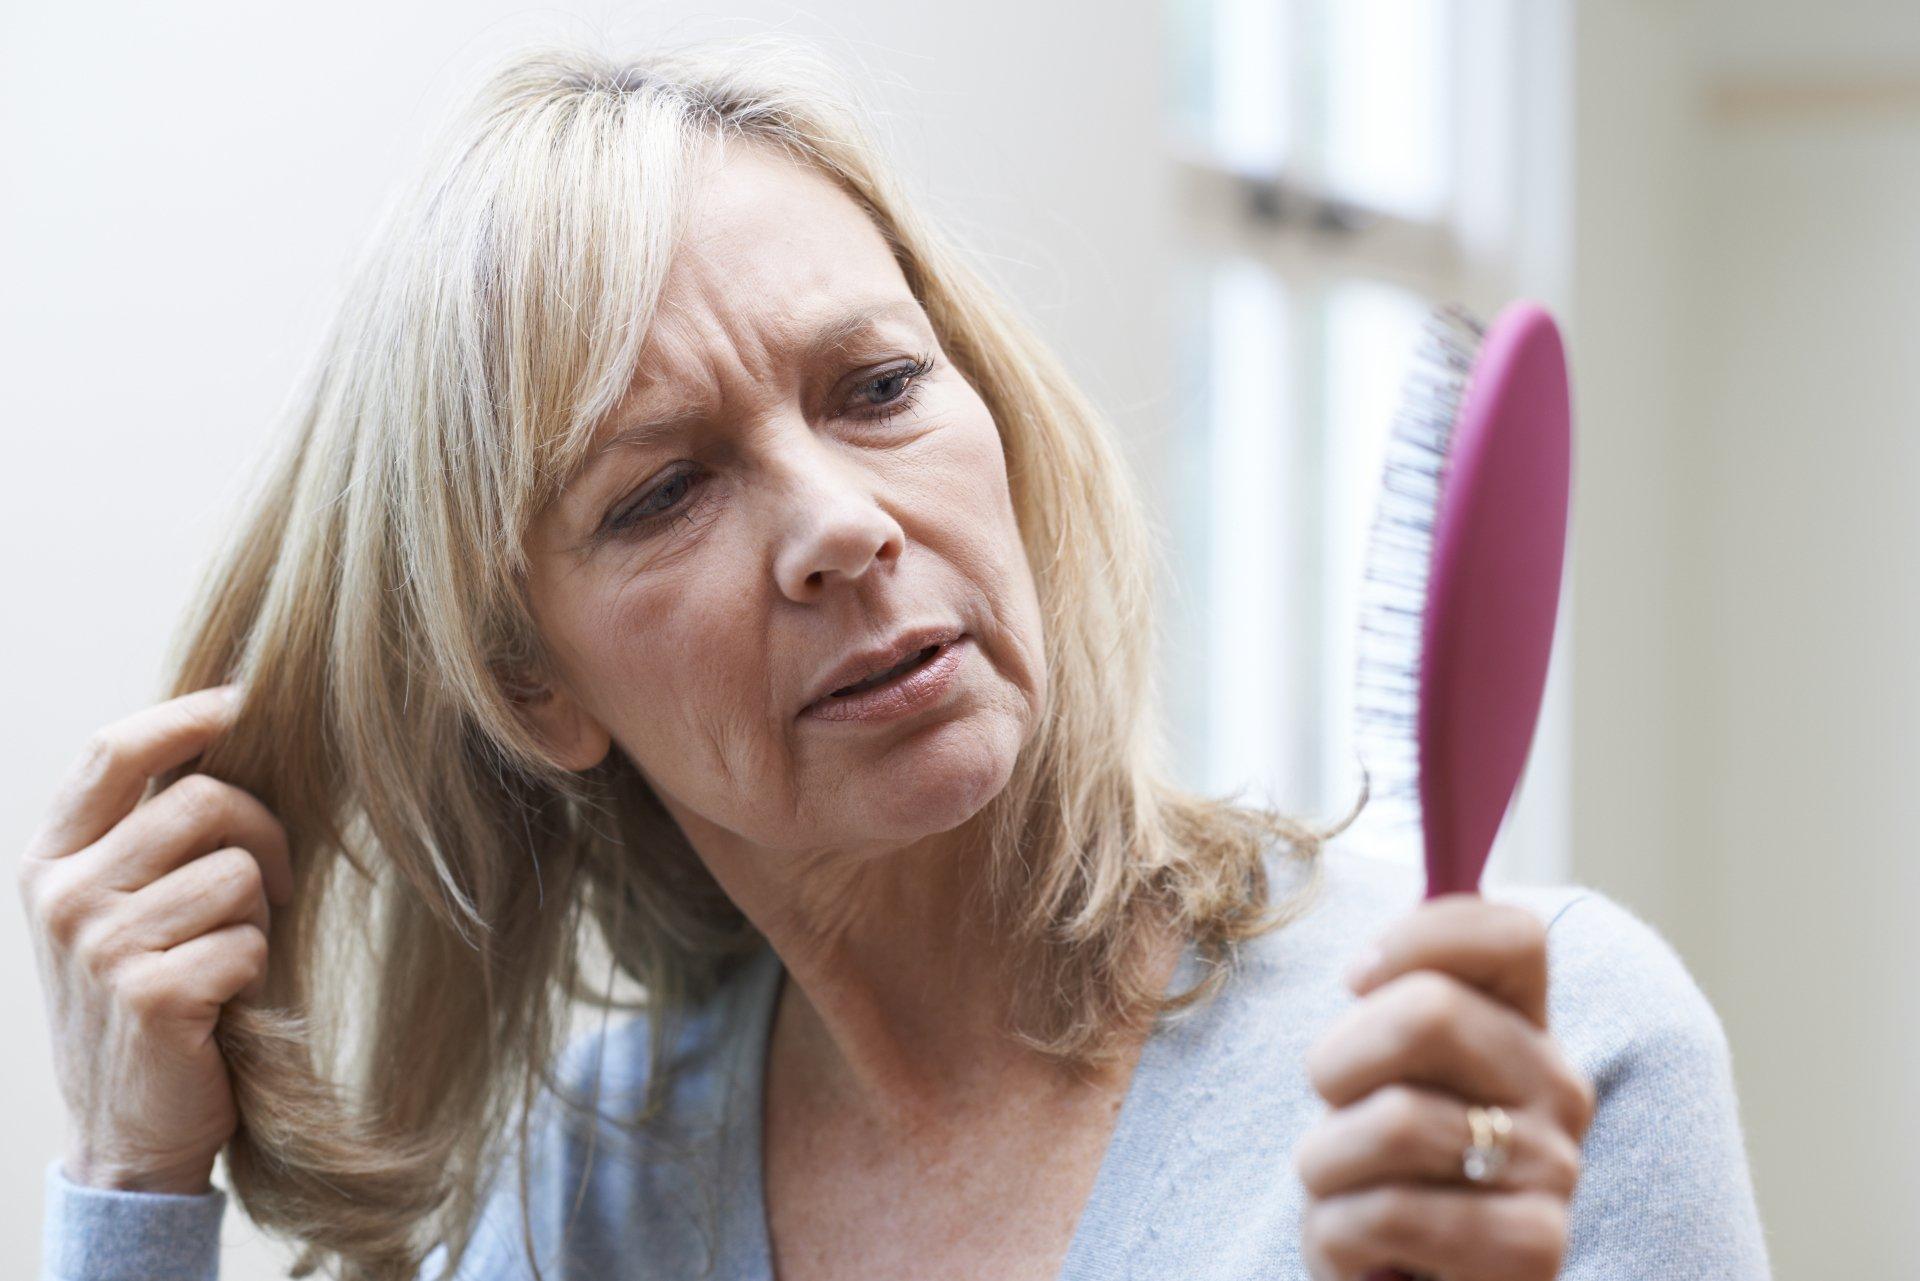 hair loss treatments clifton park